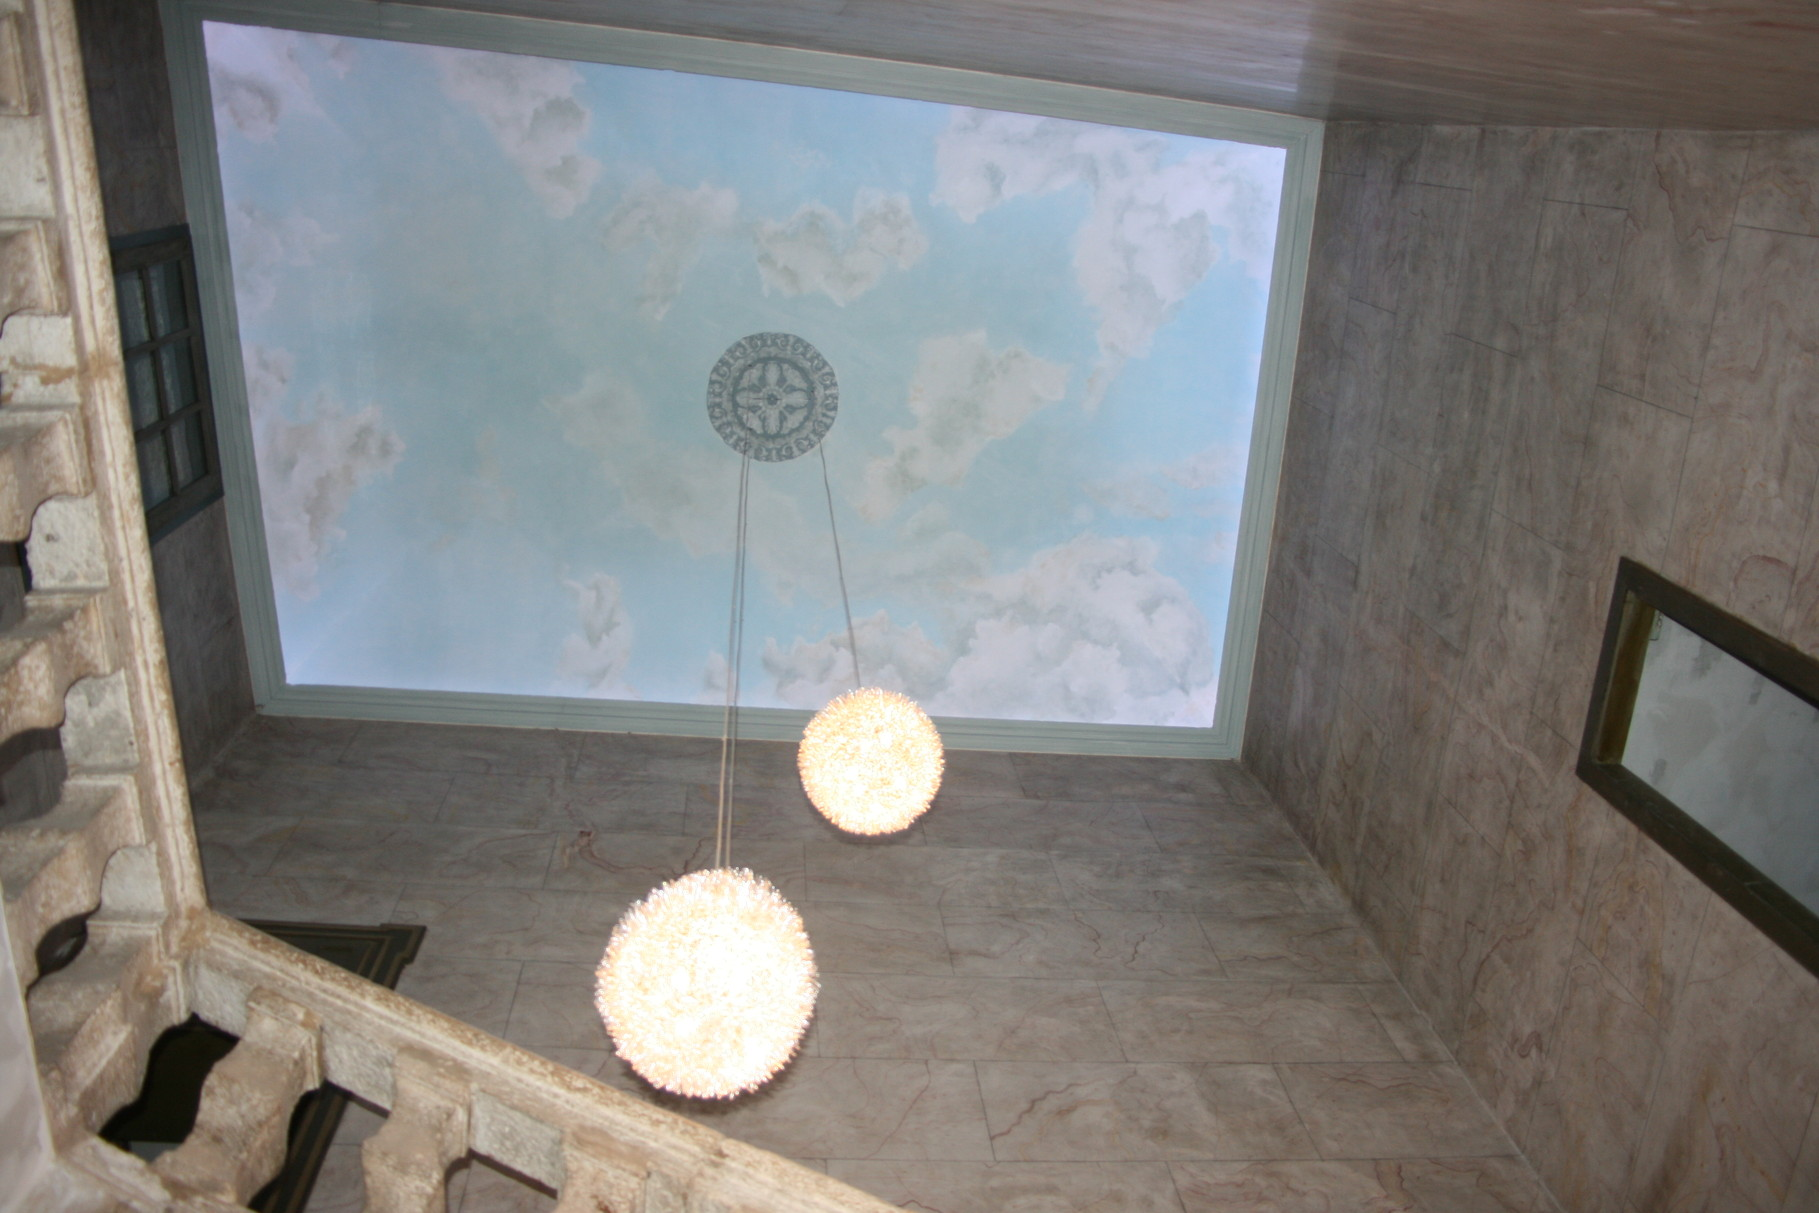 10 mètres sous plafond.